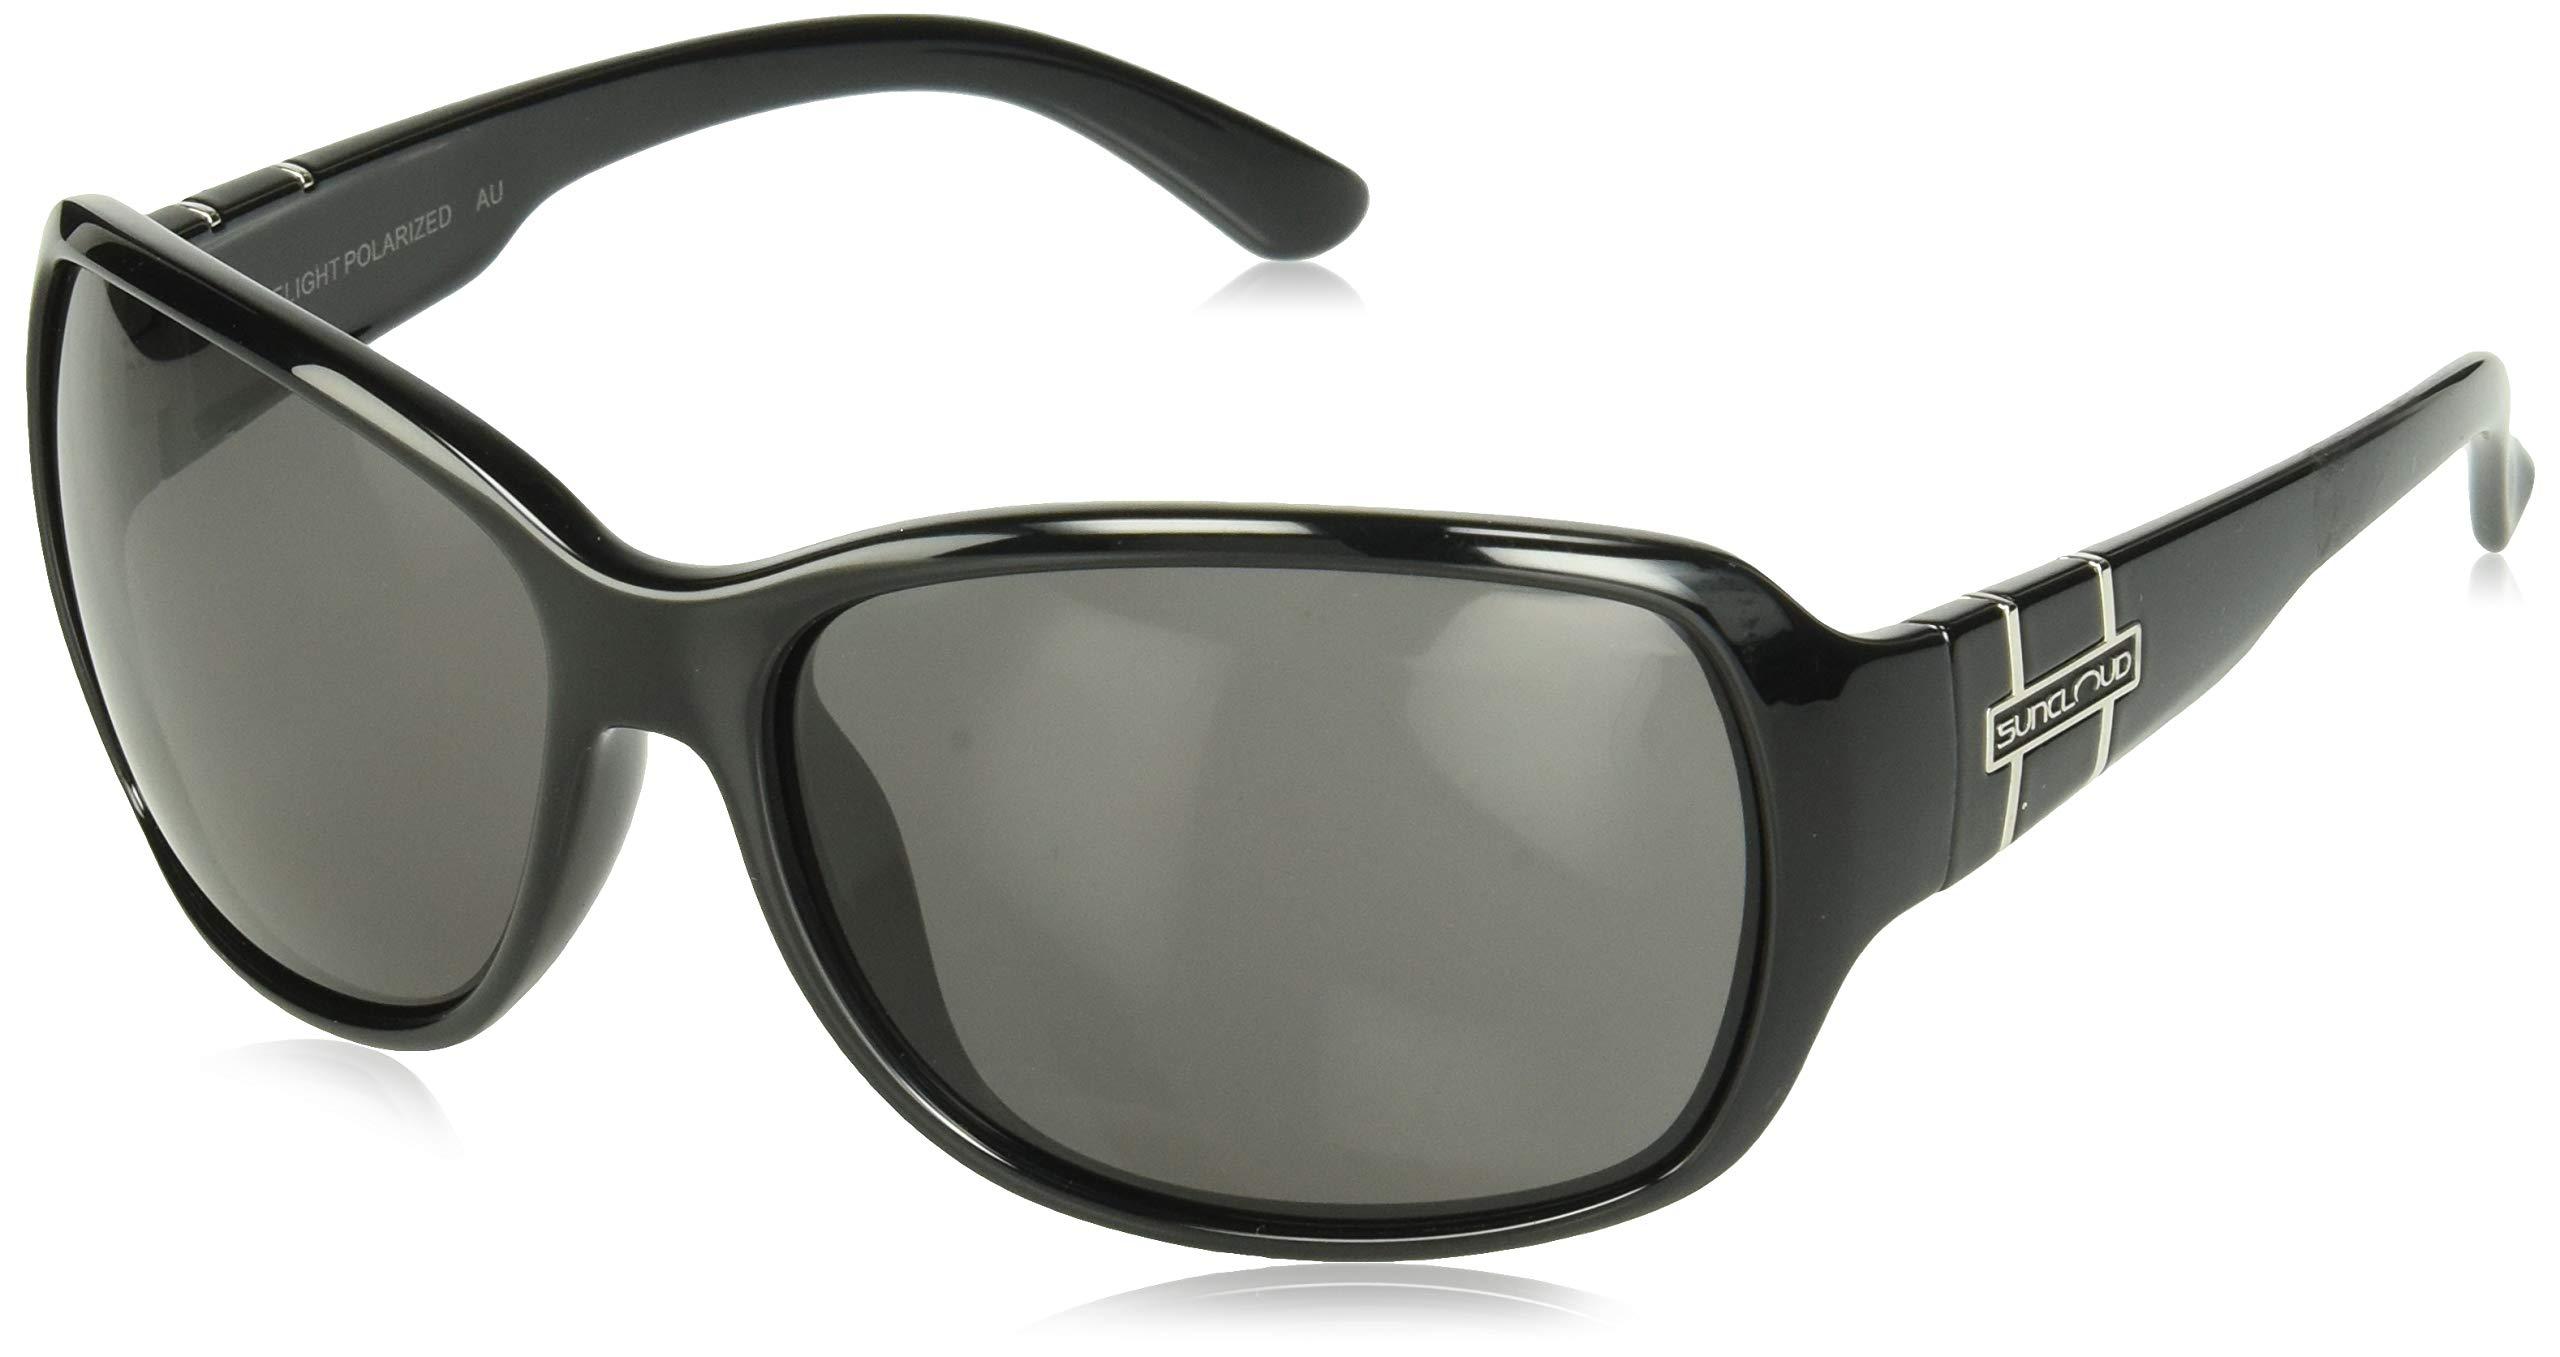 Limelight Polarized Sunglasses